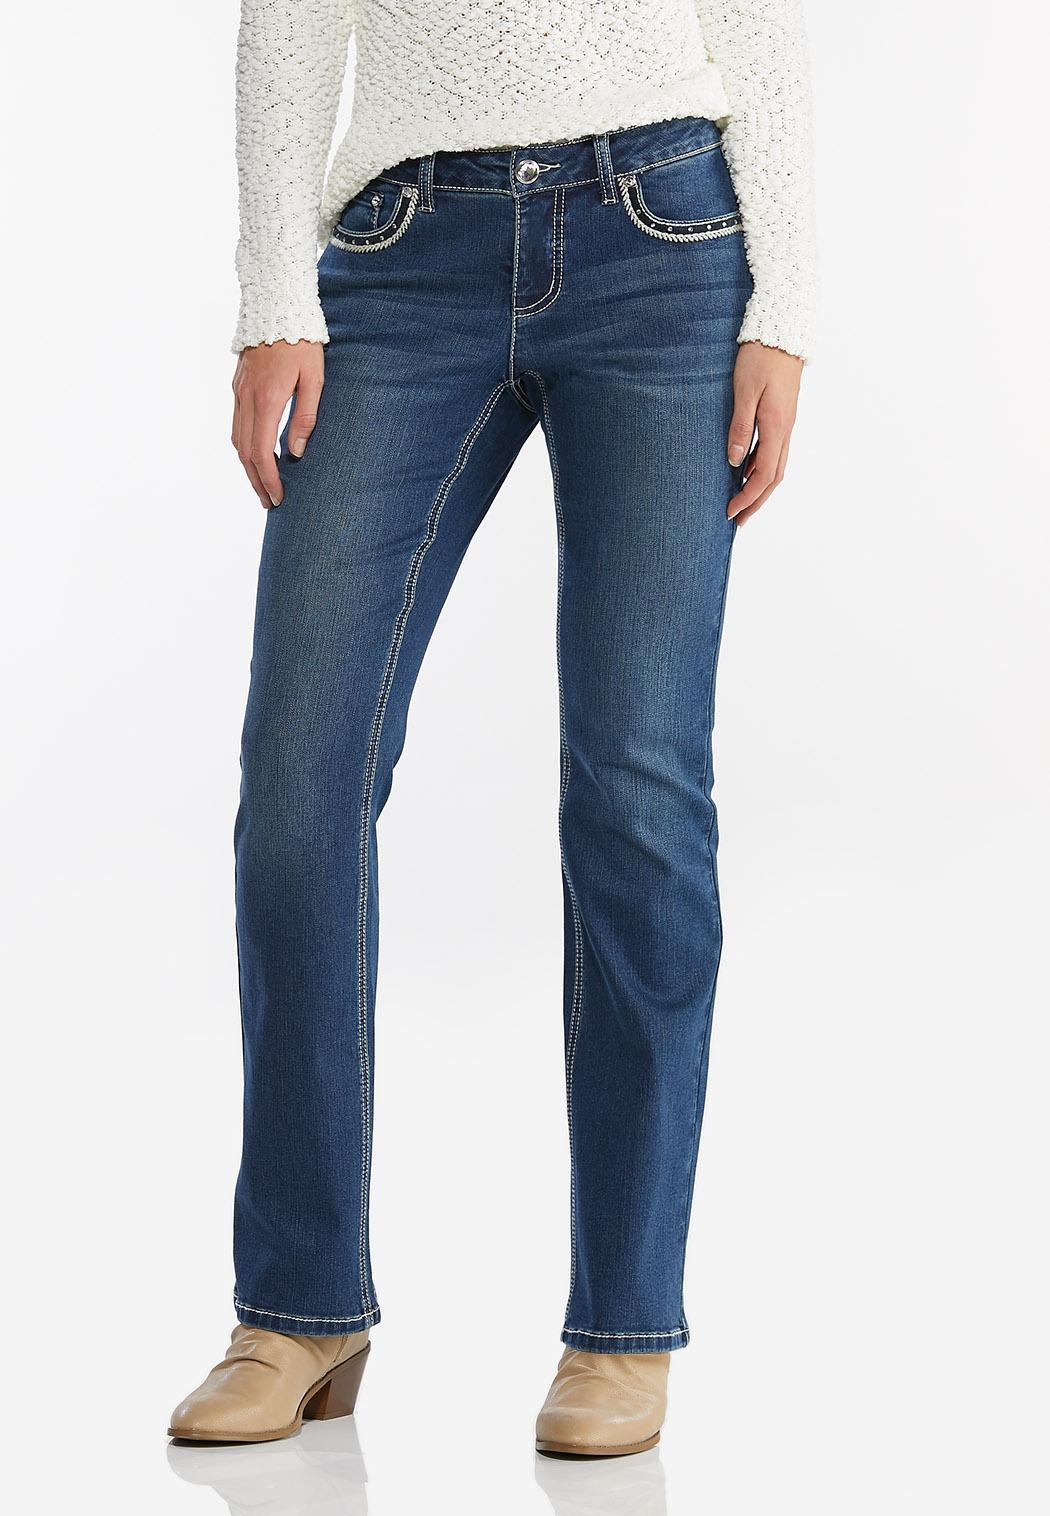 Rhinestone Cross Embellished Jeans (Item #44441067)